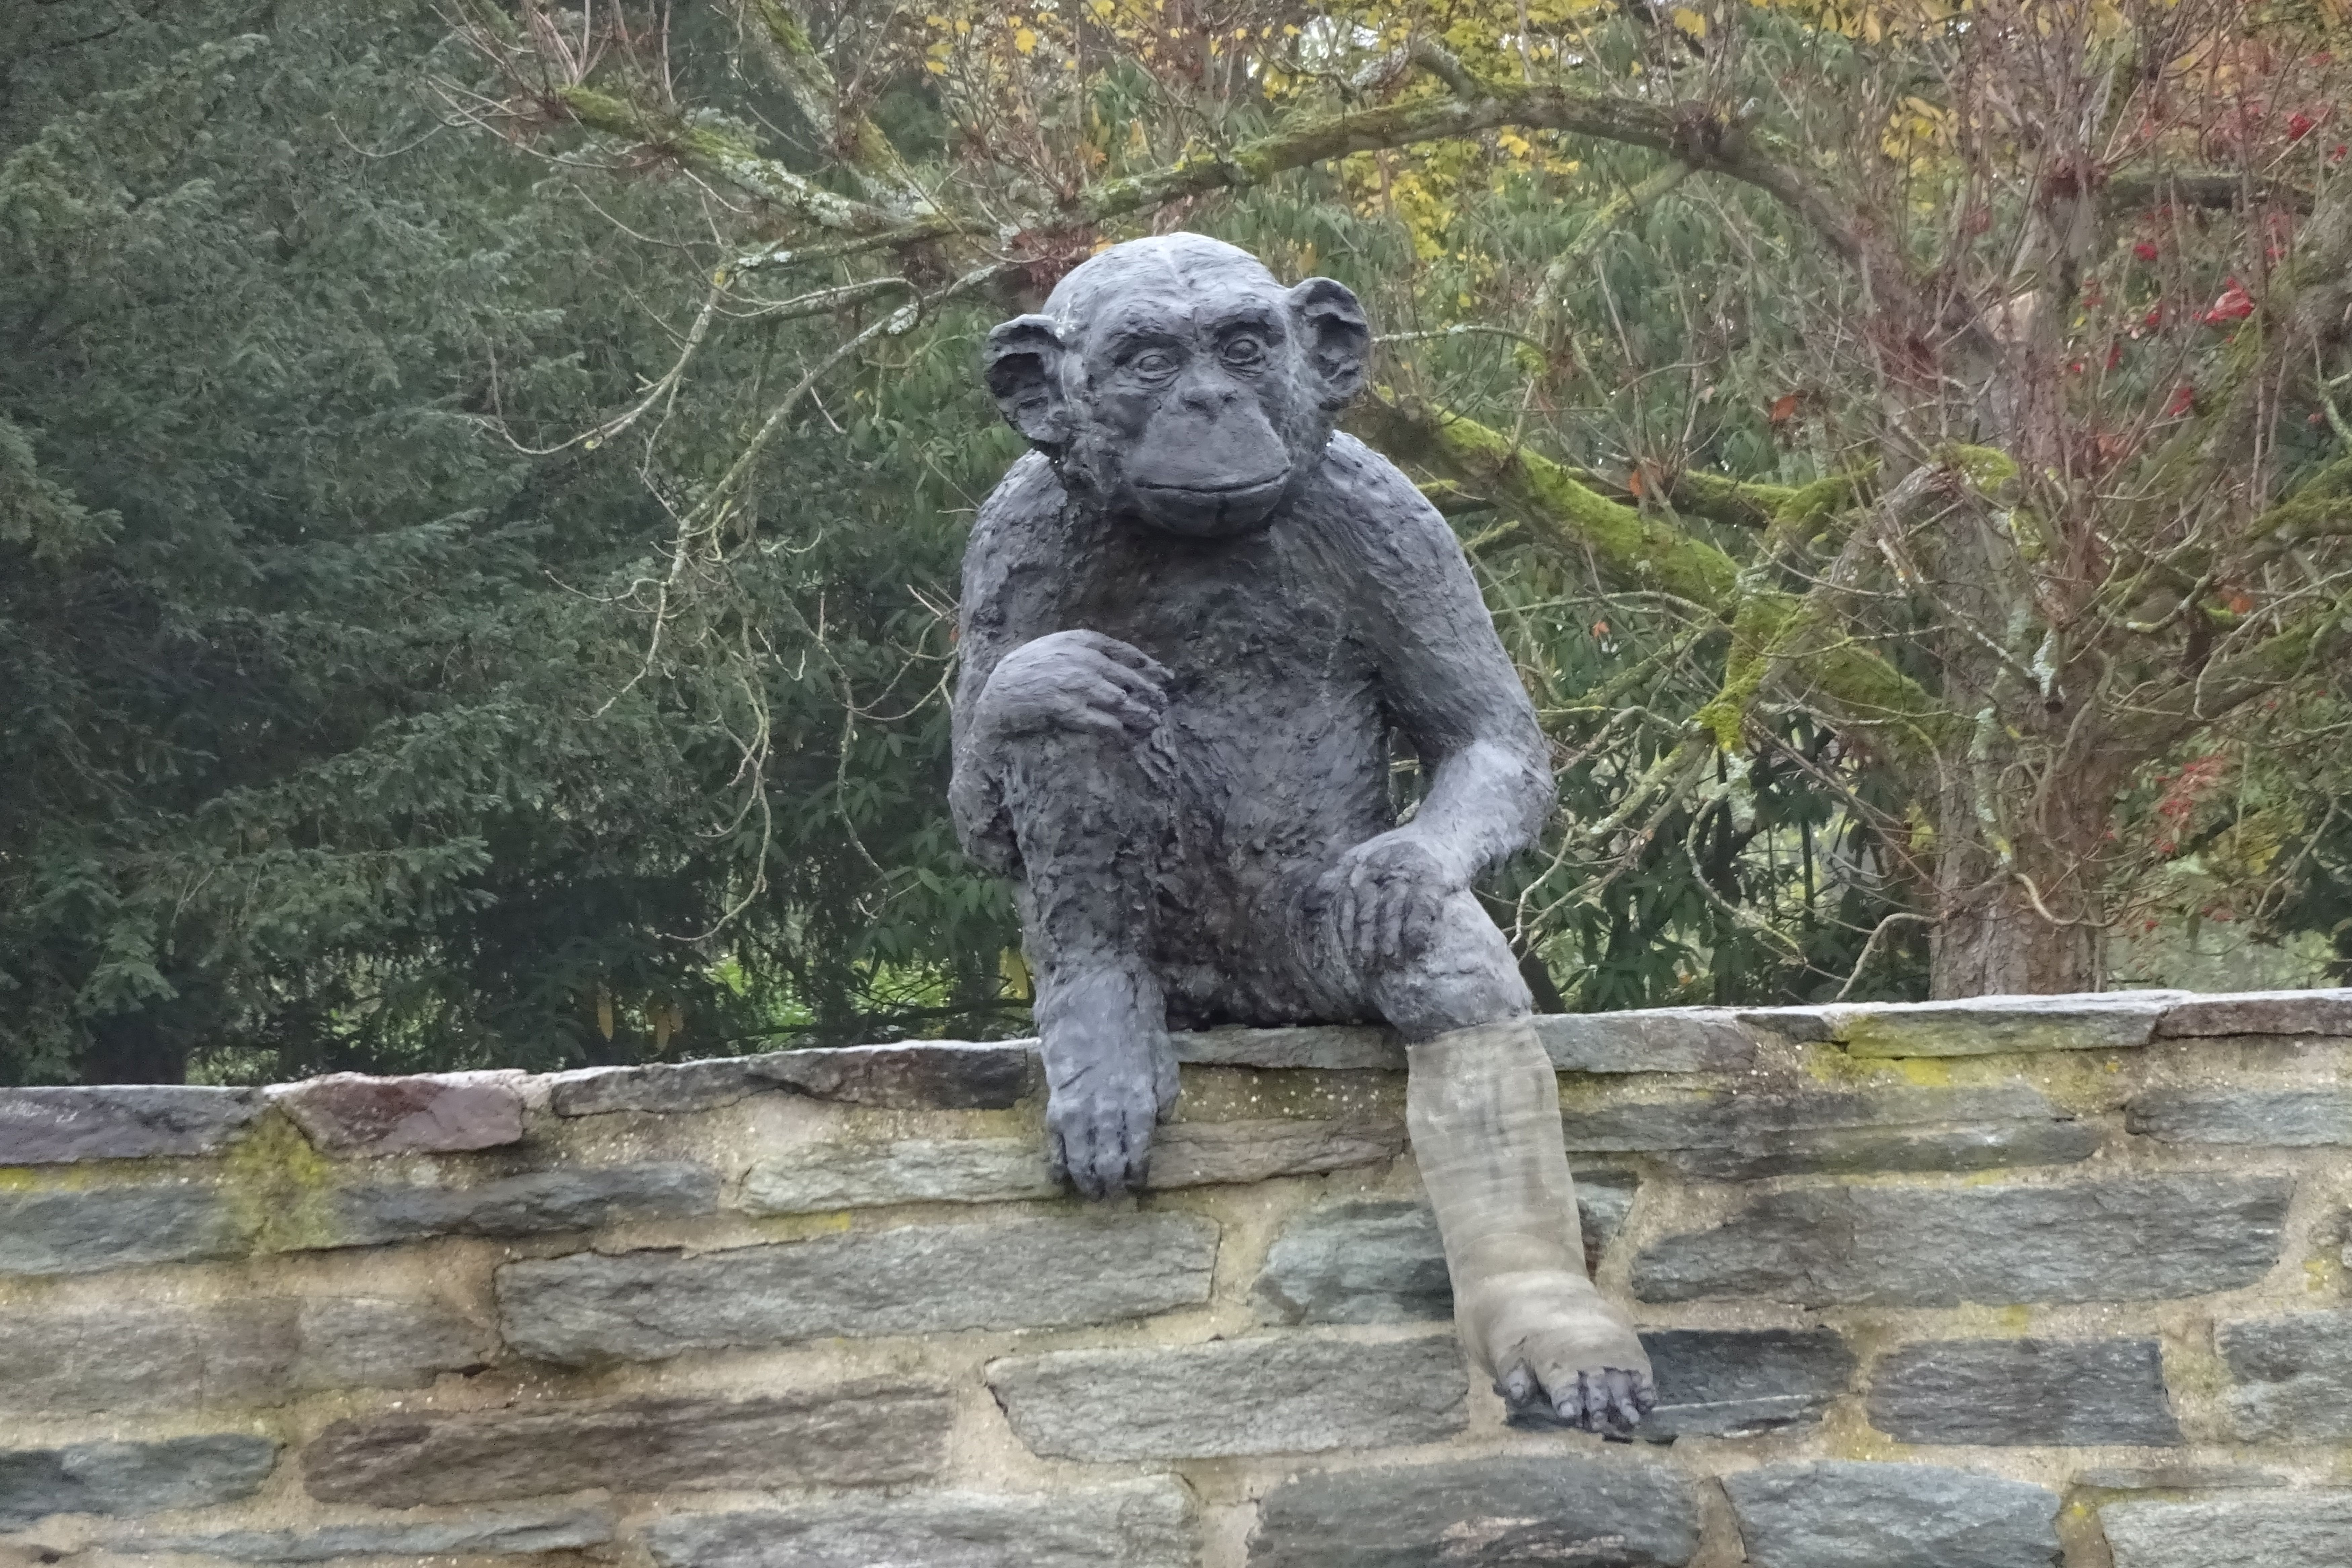 Skulpturenpark Eschborn-Niederhöchstadt